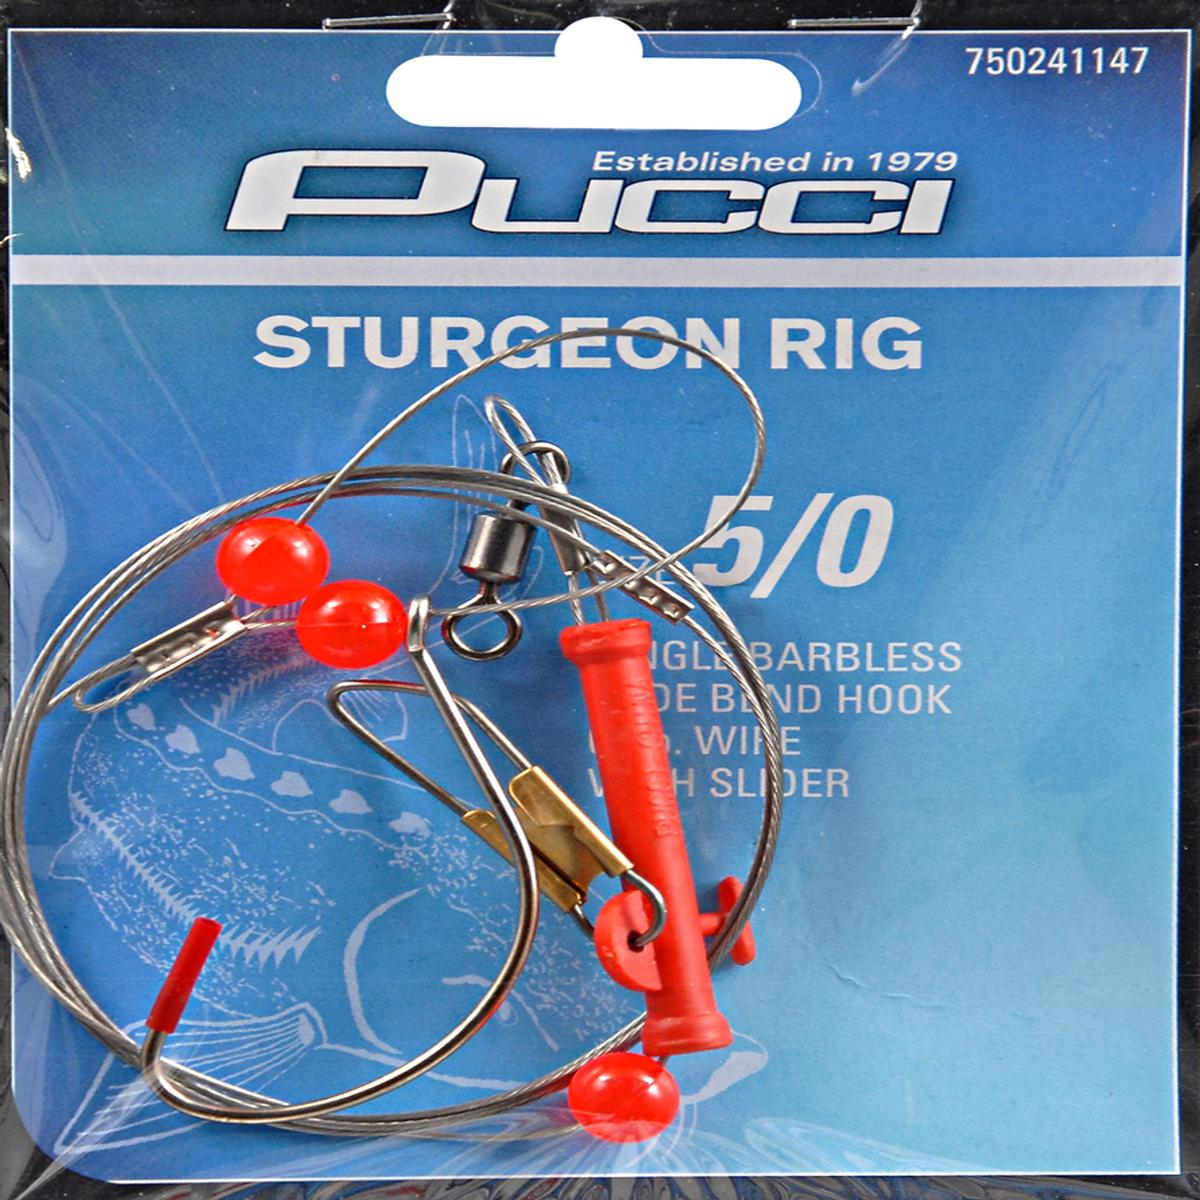 P-Line Sturgeon Rig with Slider